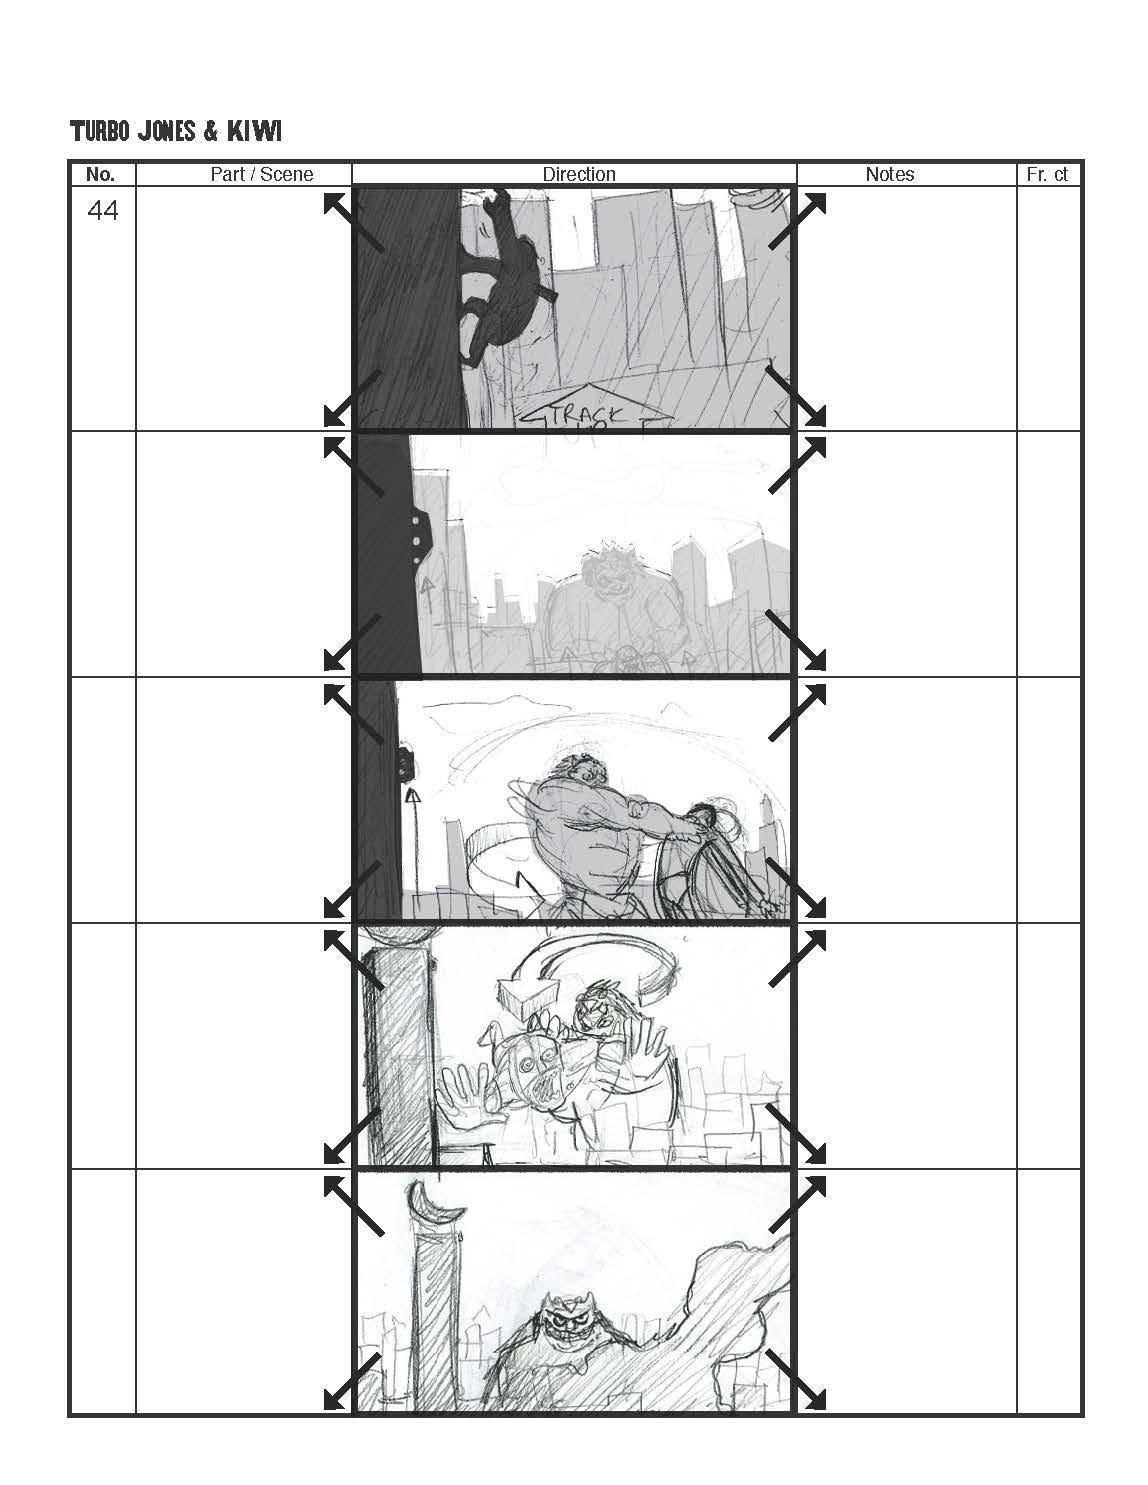 TJK_Storyboards_v01_HIGH_Page_23.jpg